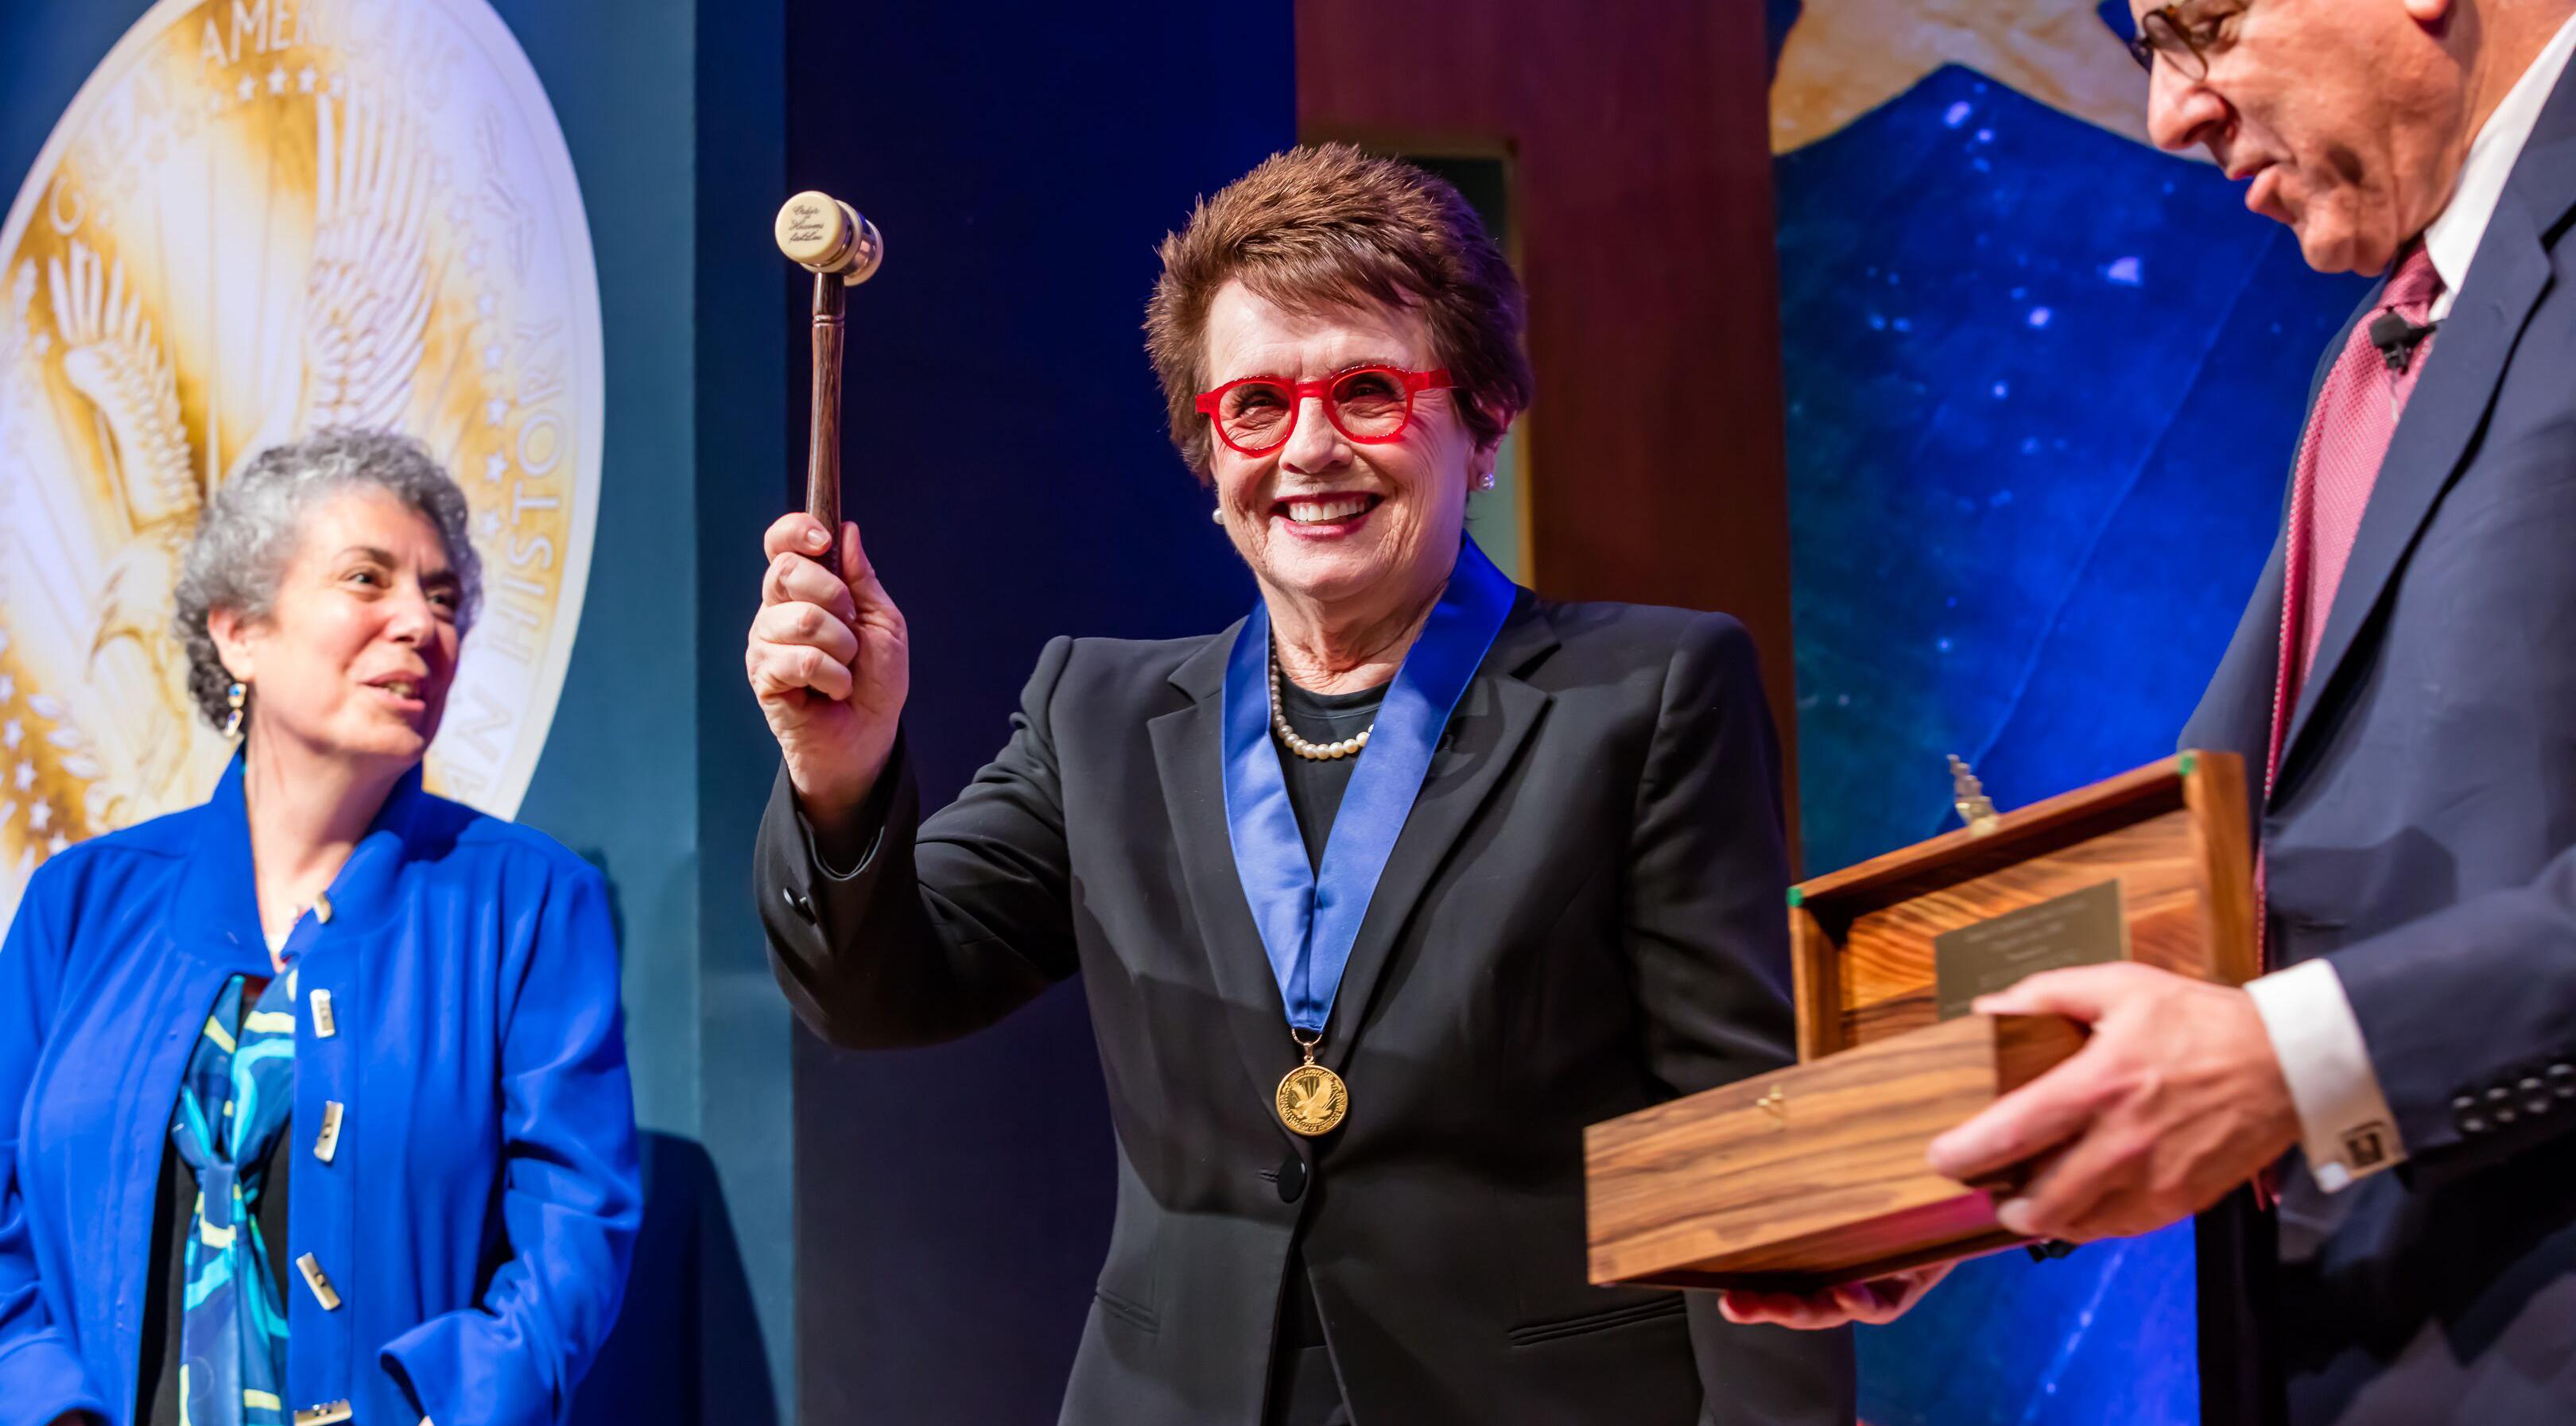 Billie Jean King <p>Sports Legend and Activist</p> photo